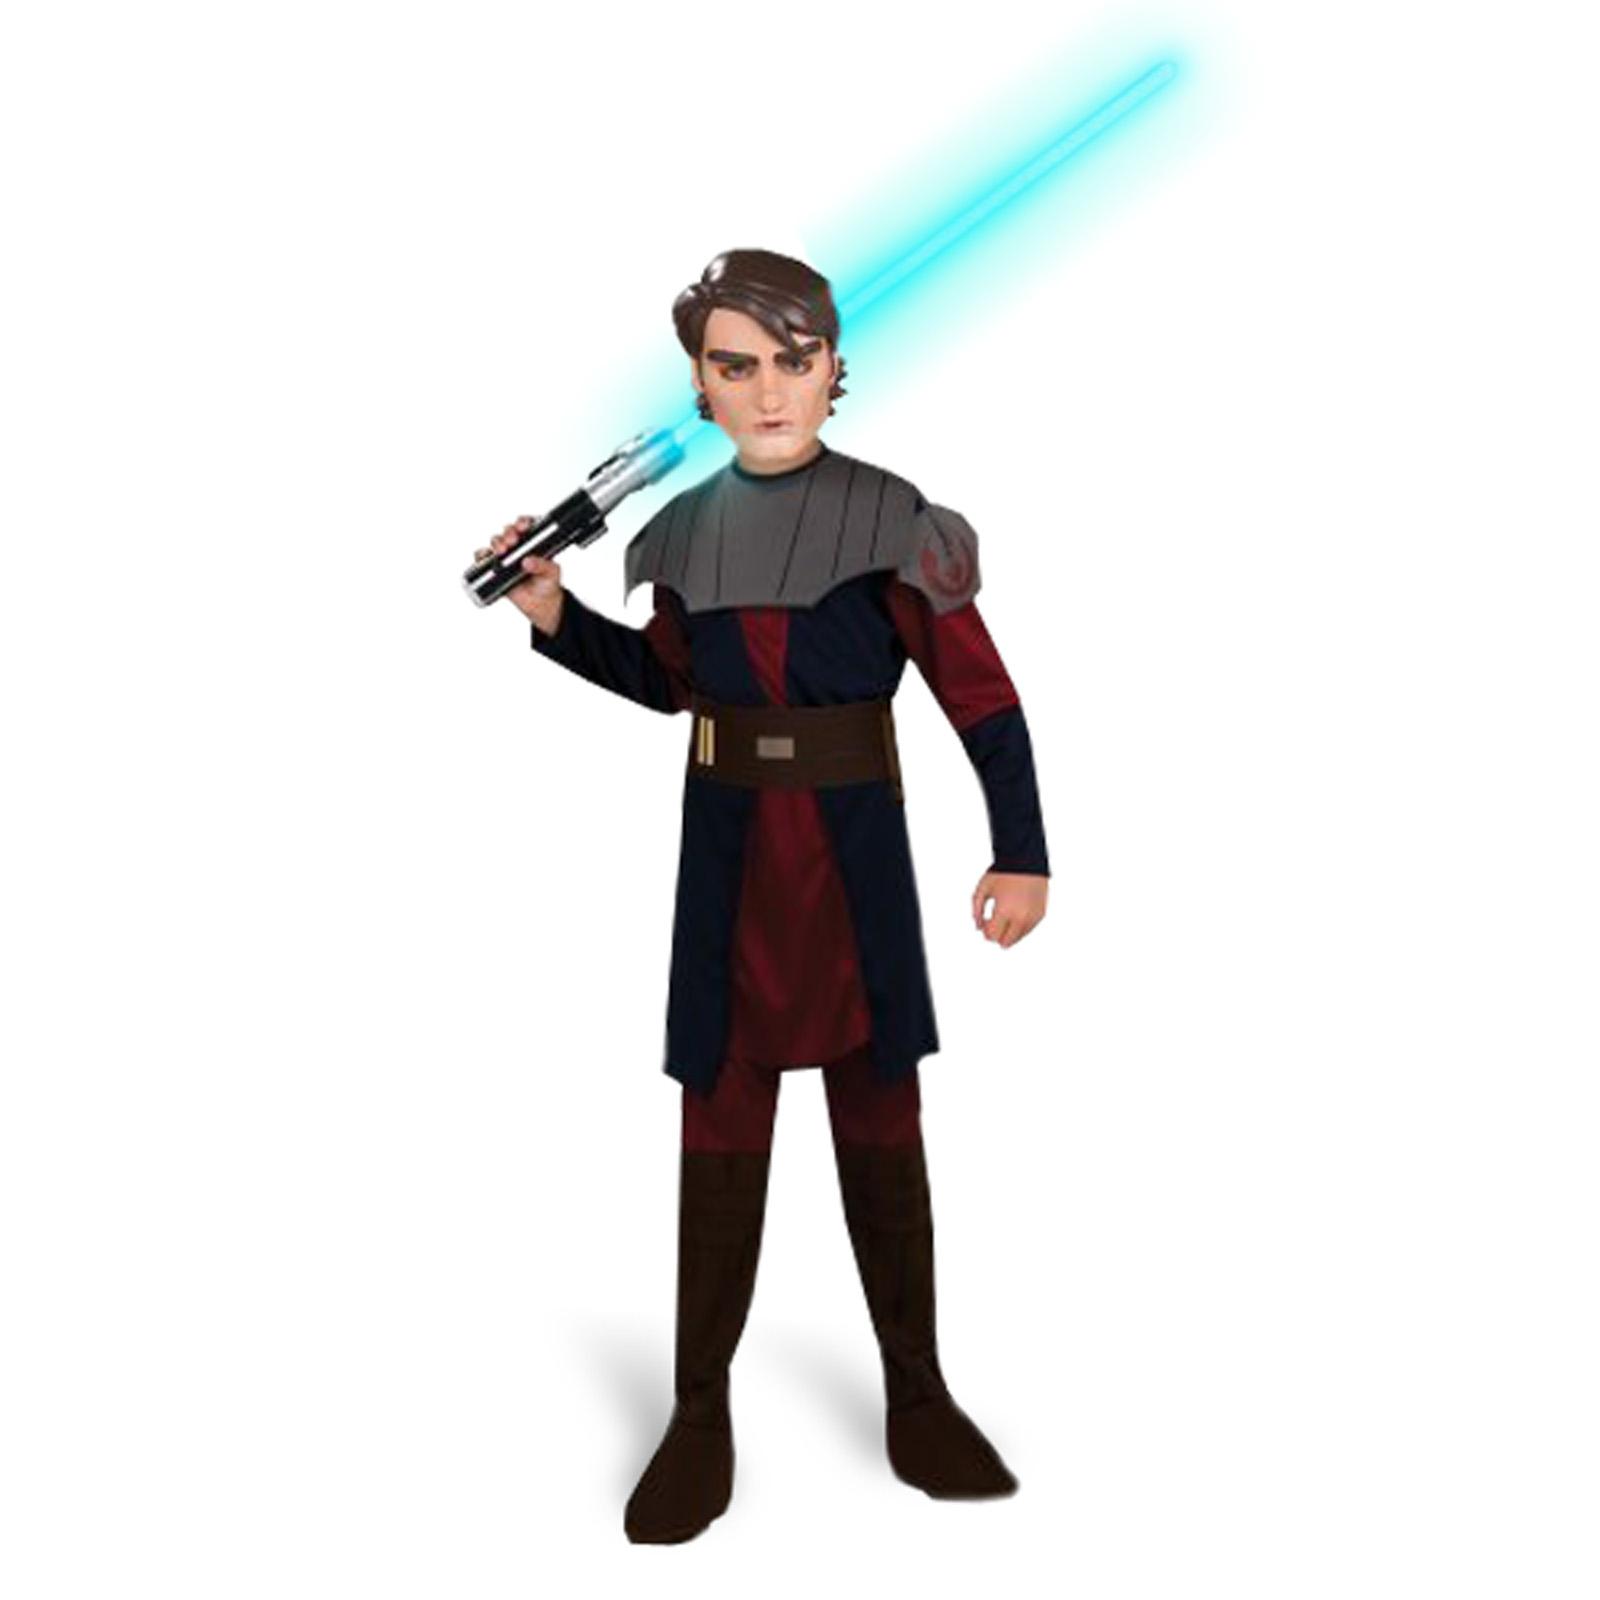 Star Wars Anakin Skywalker - Kinderkostüm